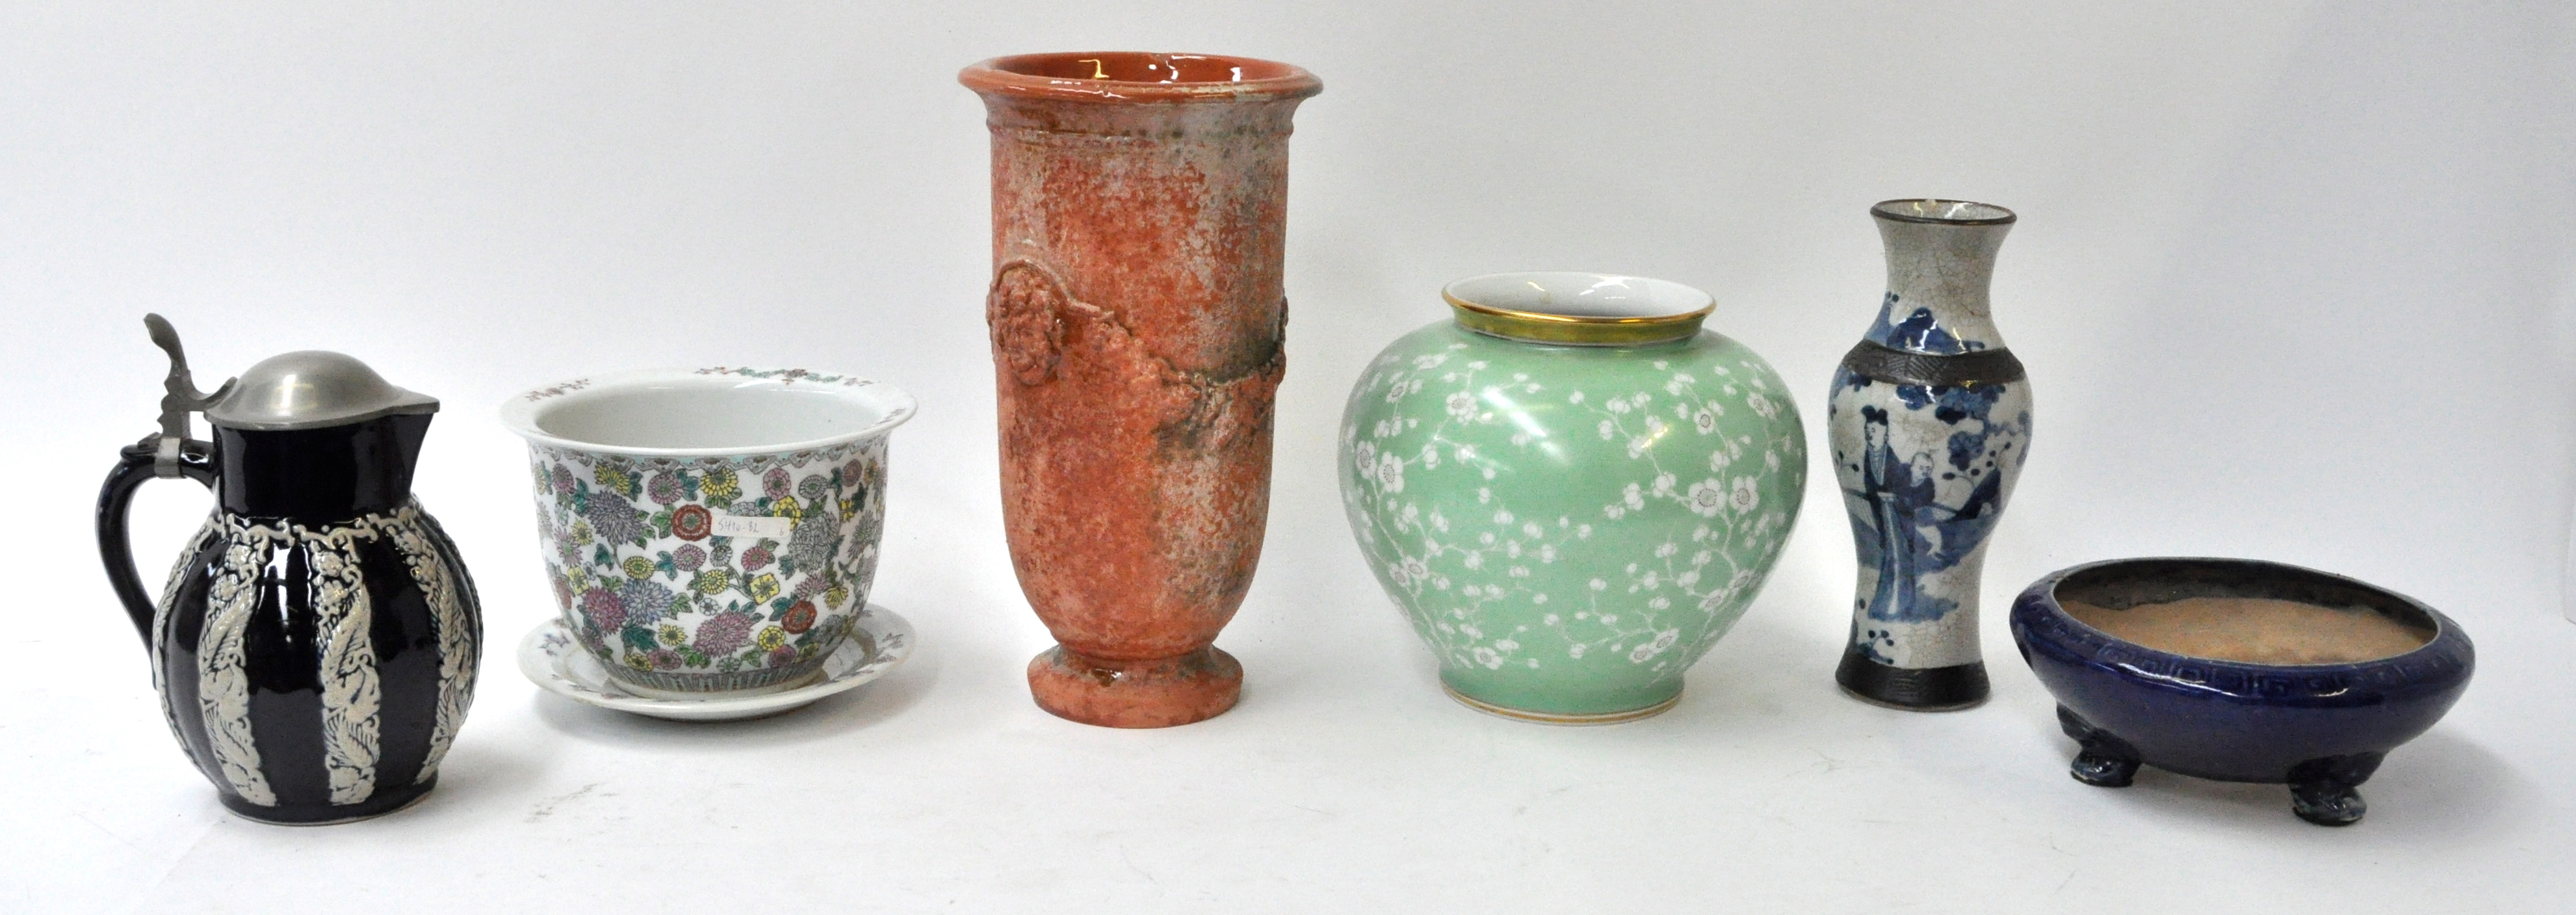 Lot aardewerk en porselein, bestaande uit een hoge vaas met bruine ...